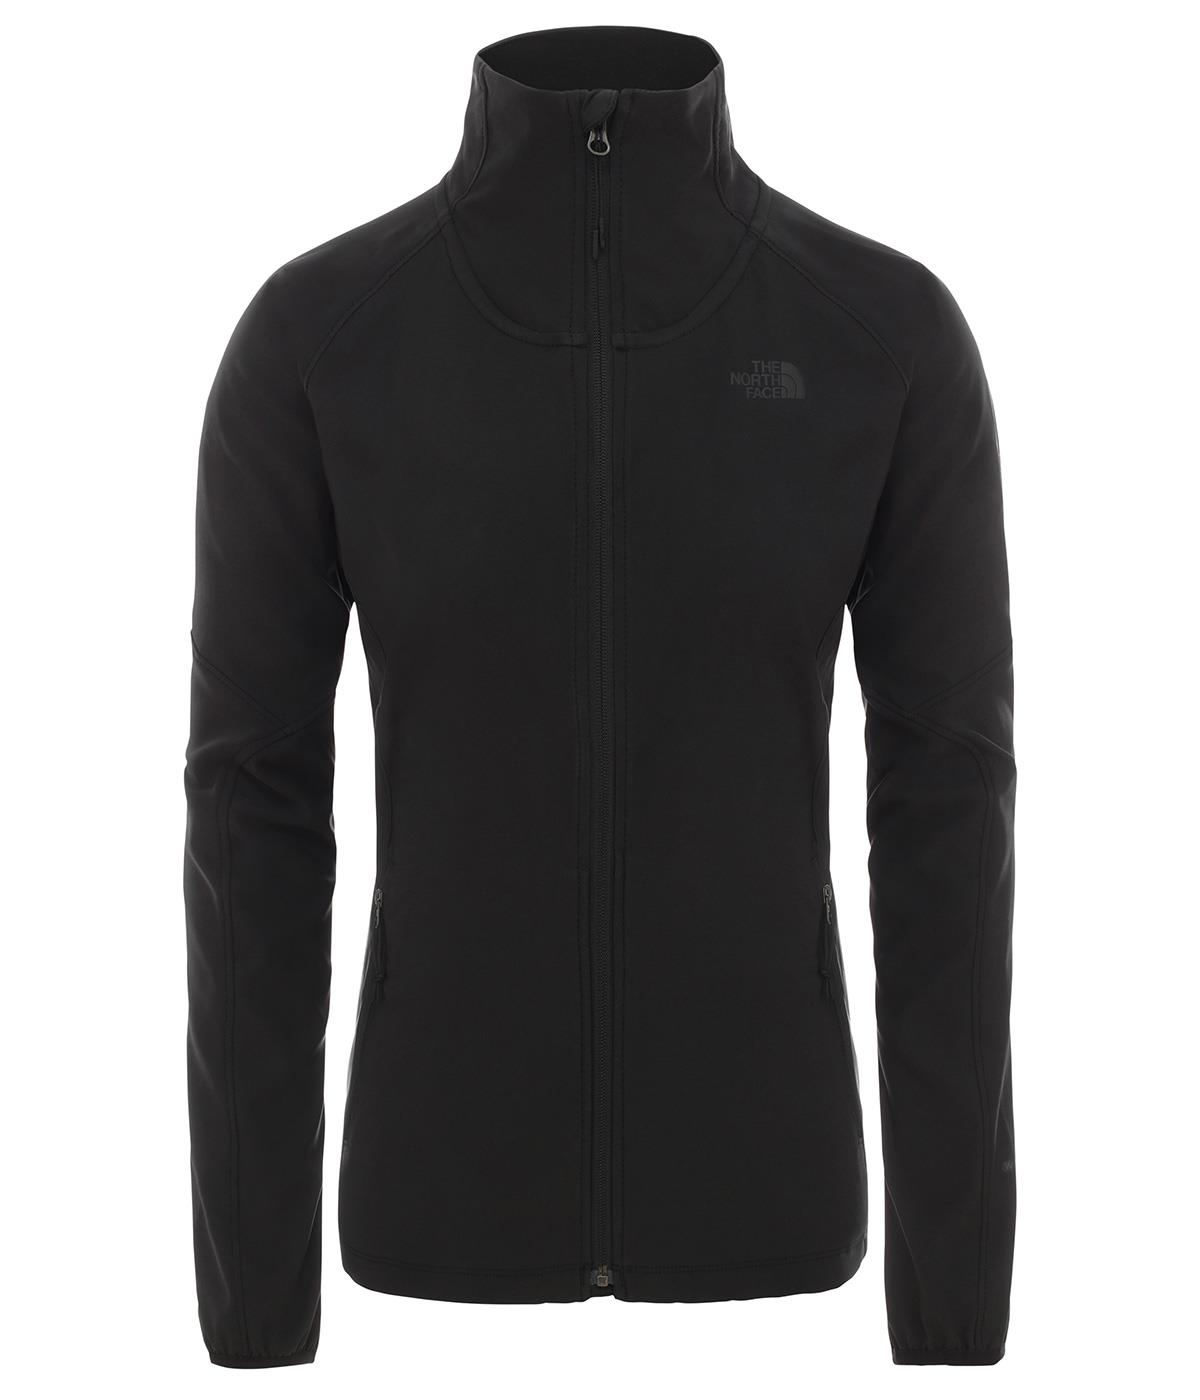 The Northface Kadın Apex Nimble Jacket T93Ocdkx7 Ceket